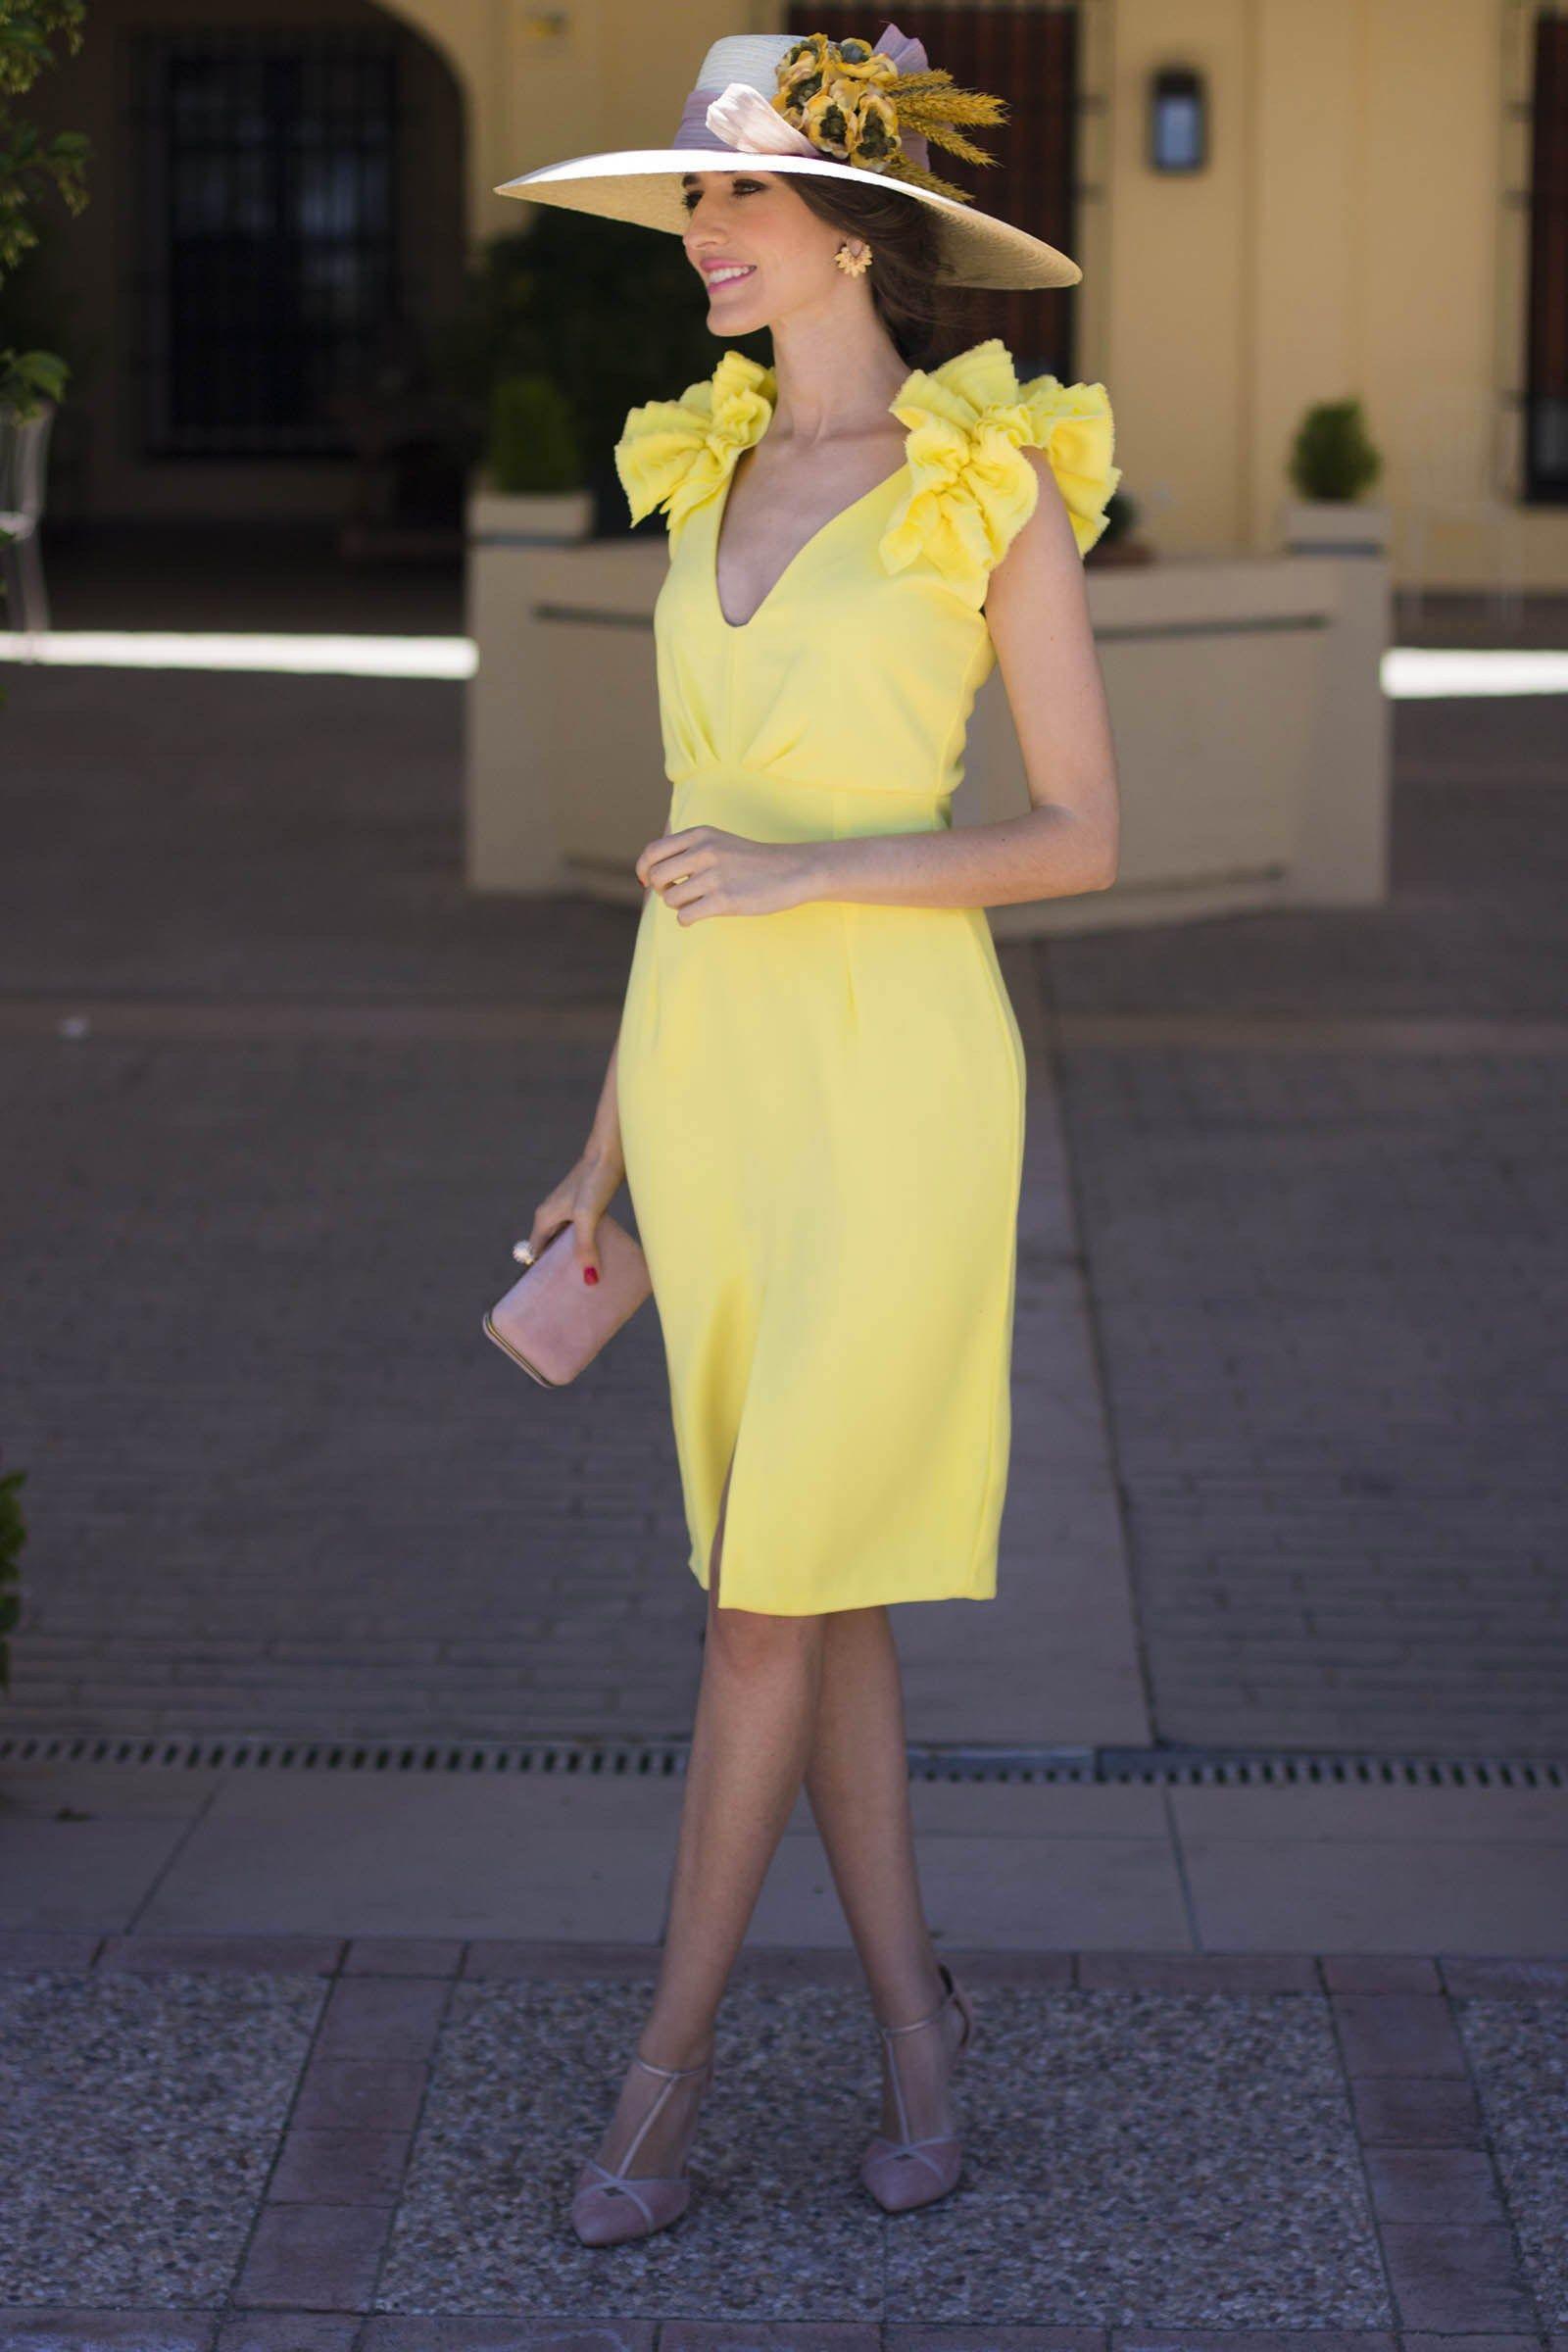 Vestido amarillo boda dia tocado | Vestidos | Pinterest | Vestido ...